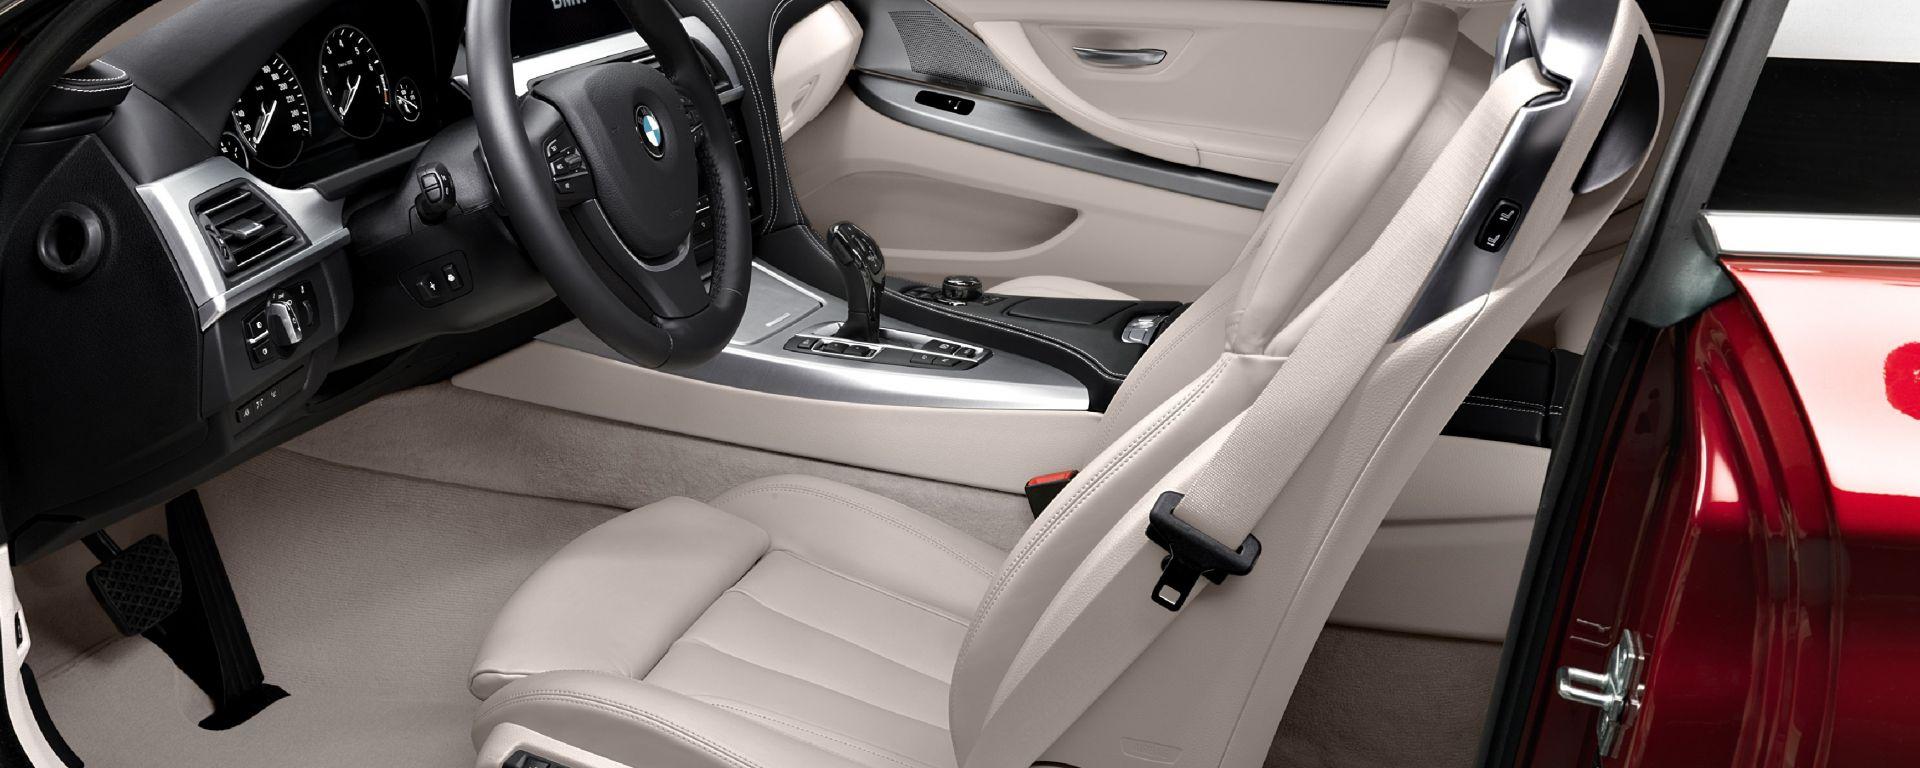 BMW Serie 6 Coupé 2012 gli interni